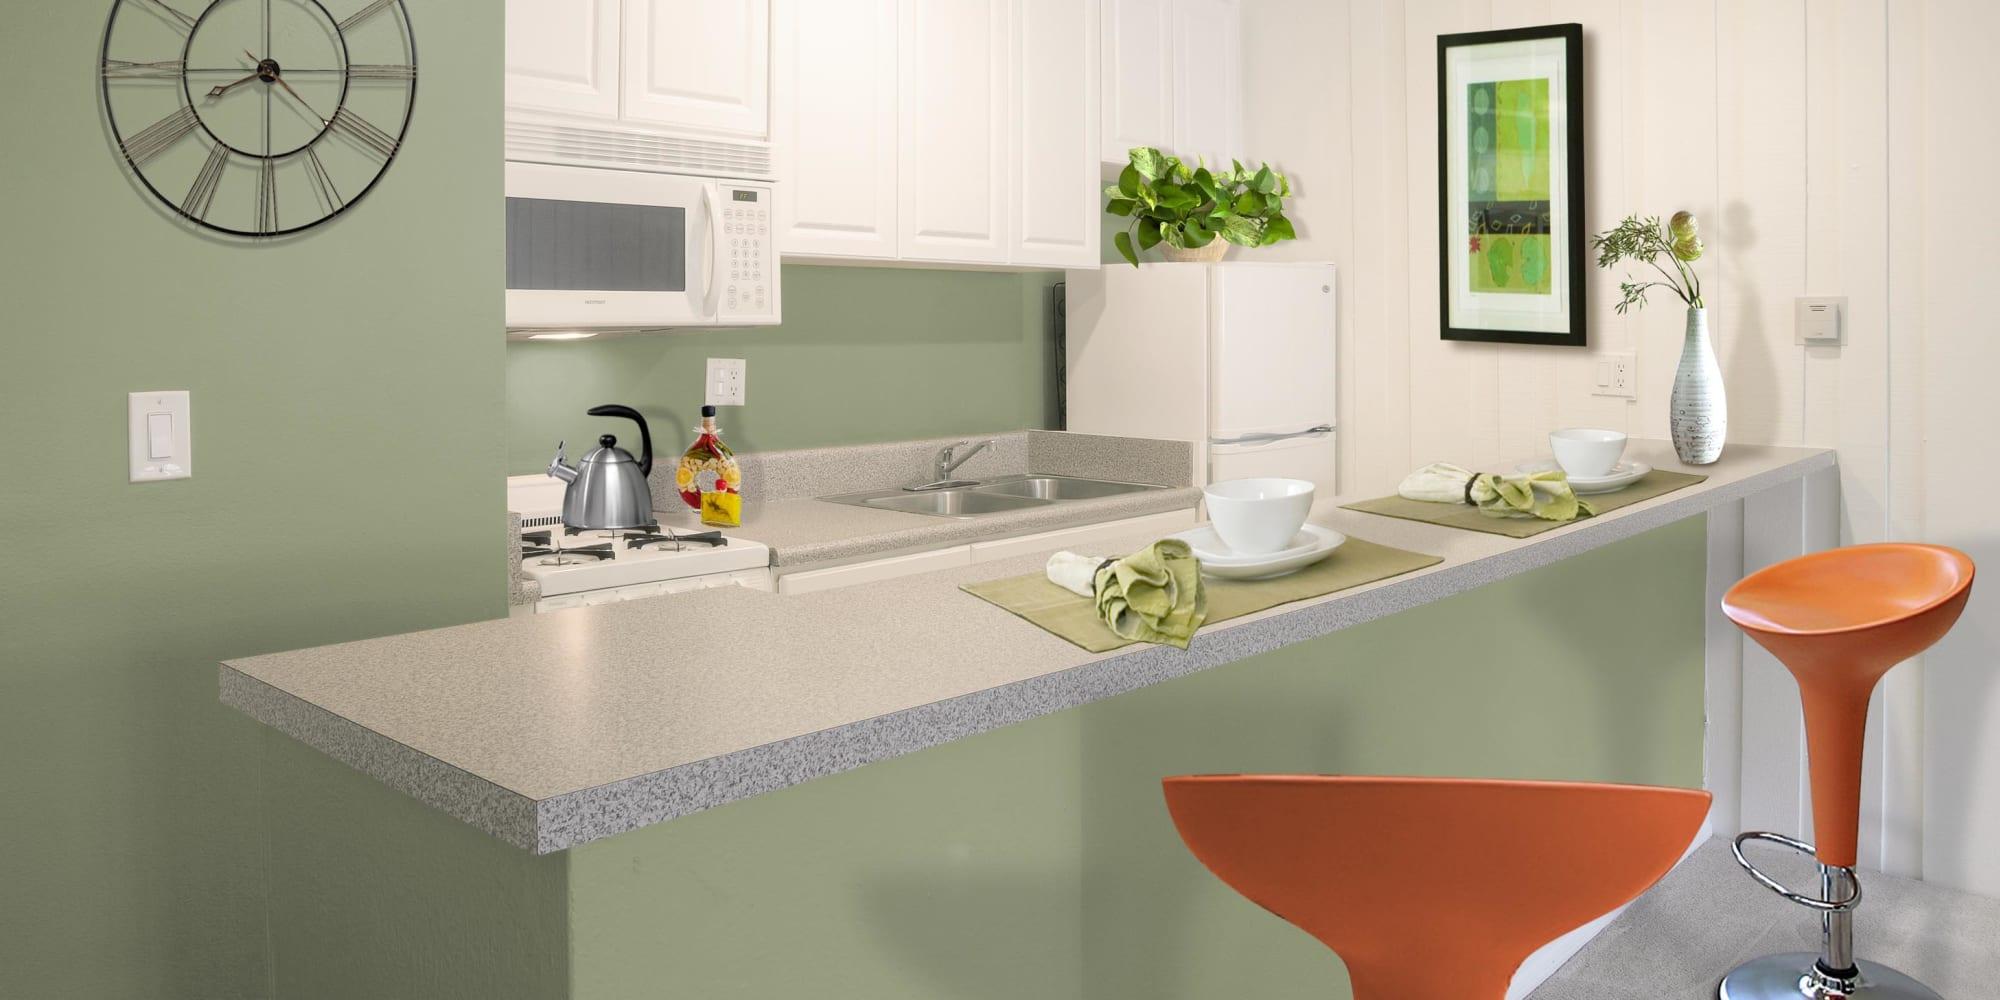 Quartz countertop and white appliances in a model apartment's kitchen at Rancho Los Feliz in Los Angeles, California